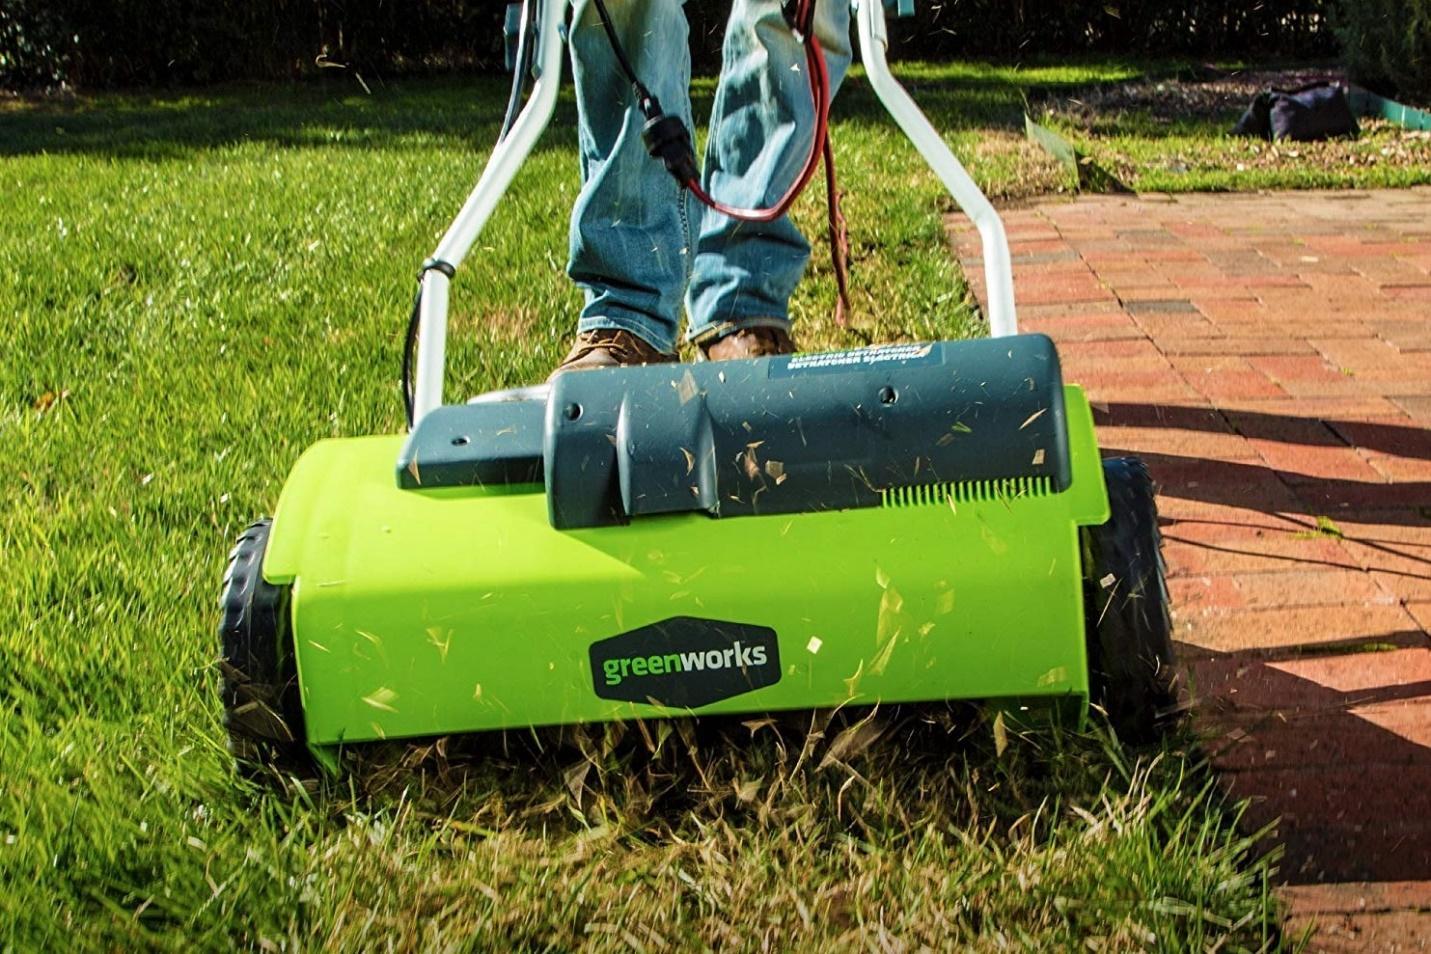 https://mydecorative.com/wp-content/uploads/2018/12/electric-lawn-dethatcher.jpg